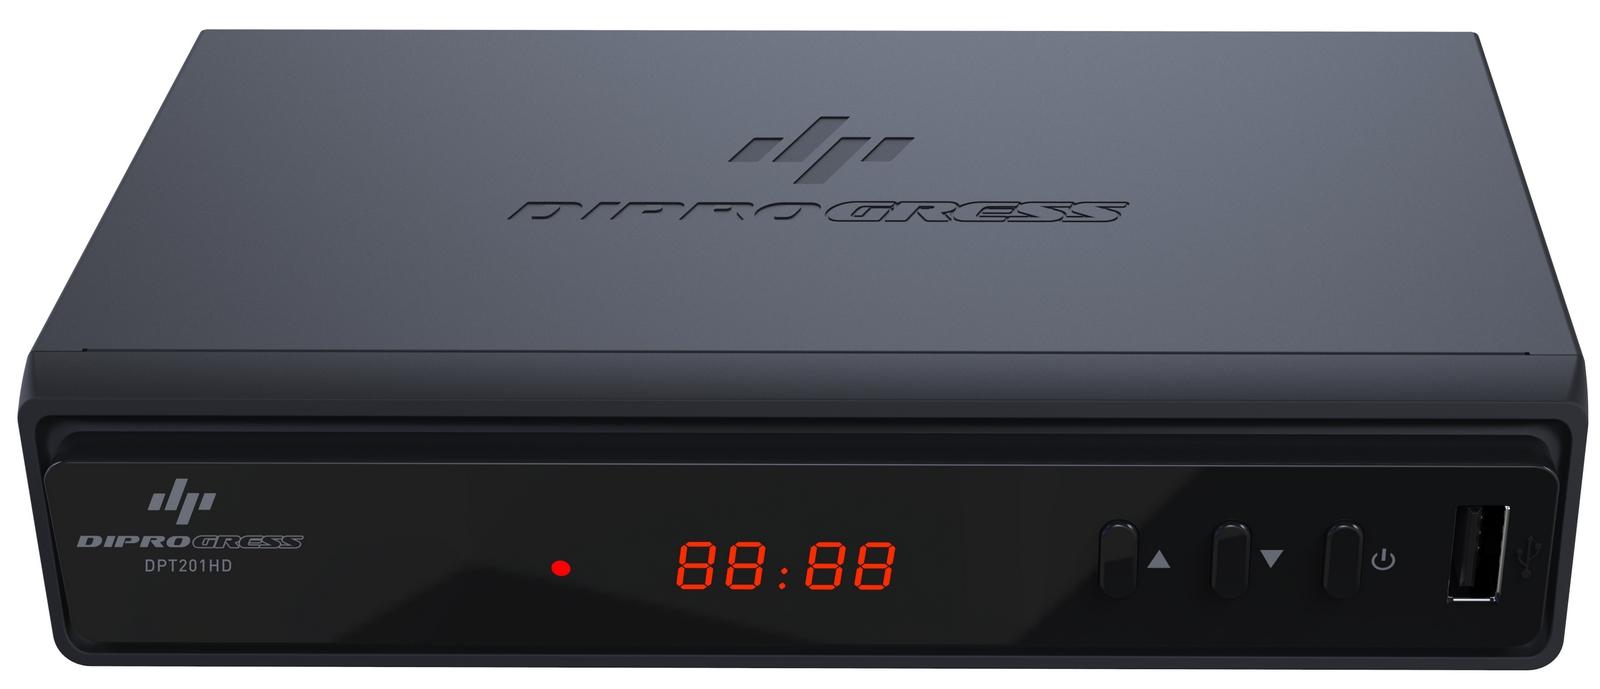 Ricevitore Digitale Terrestre DVB-T2 H265/HEVC ...